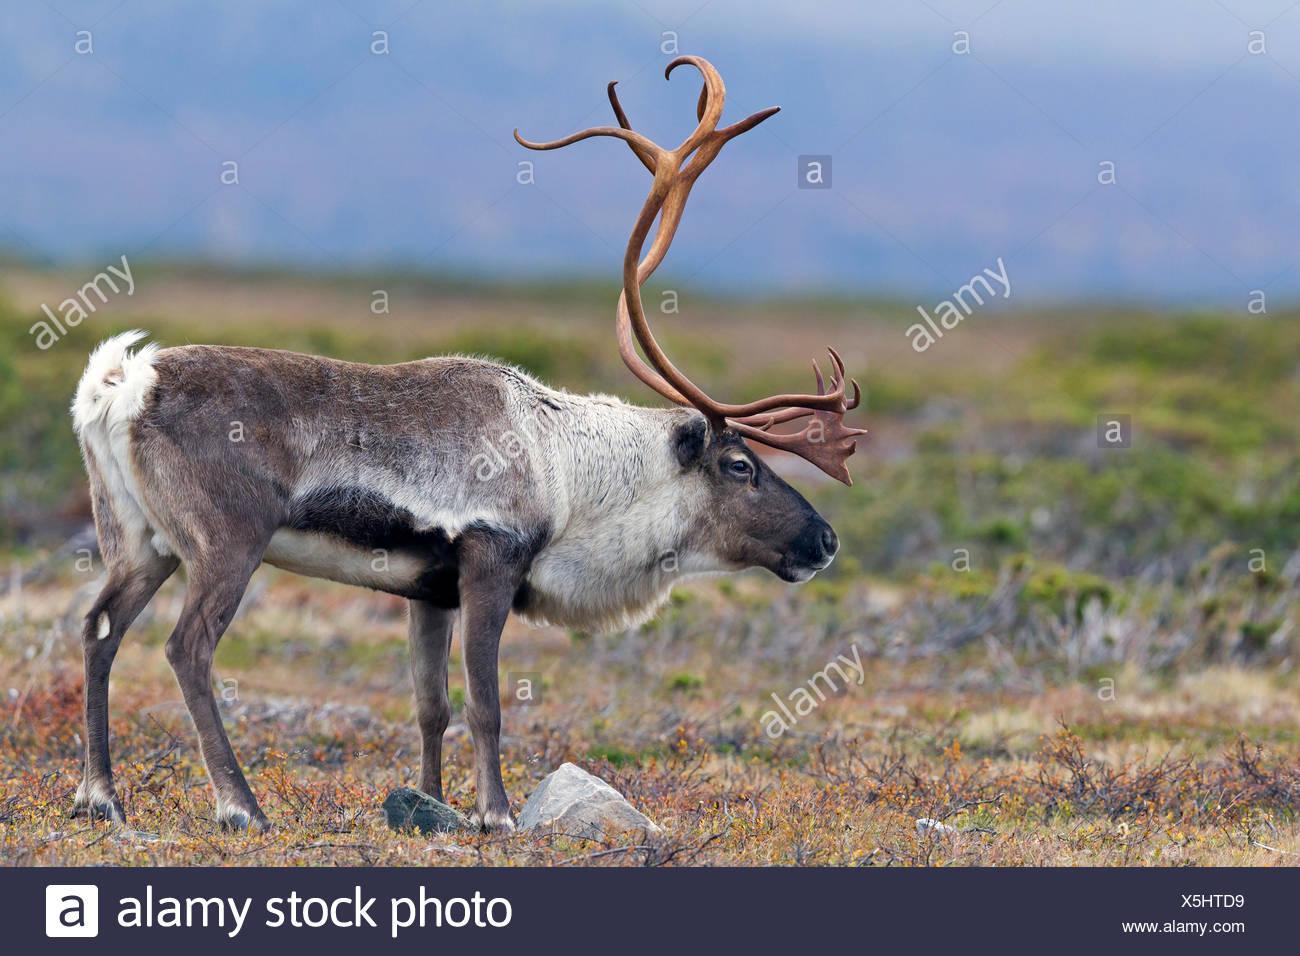 Reindeer (Rangifer tarandus), male in the tundra. Sweden - Stock Image